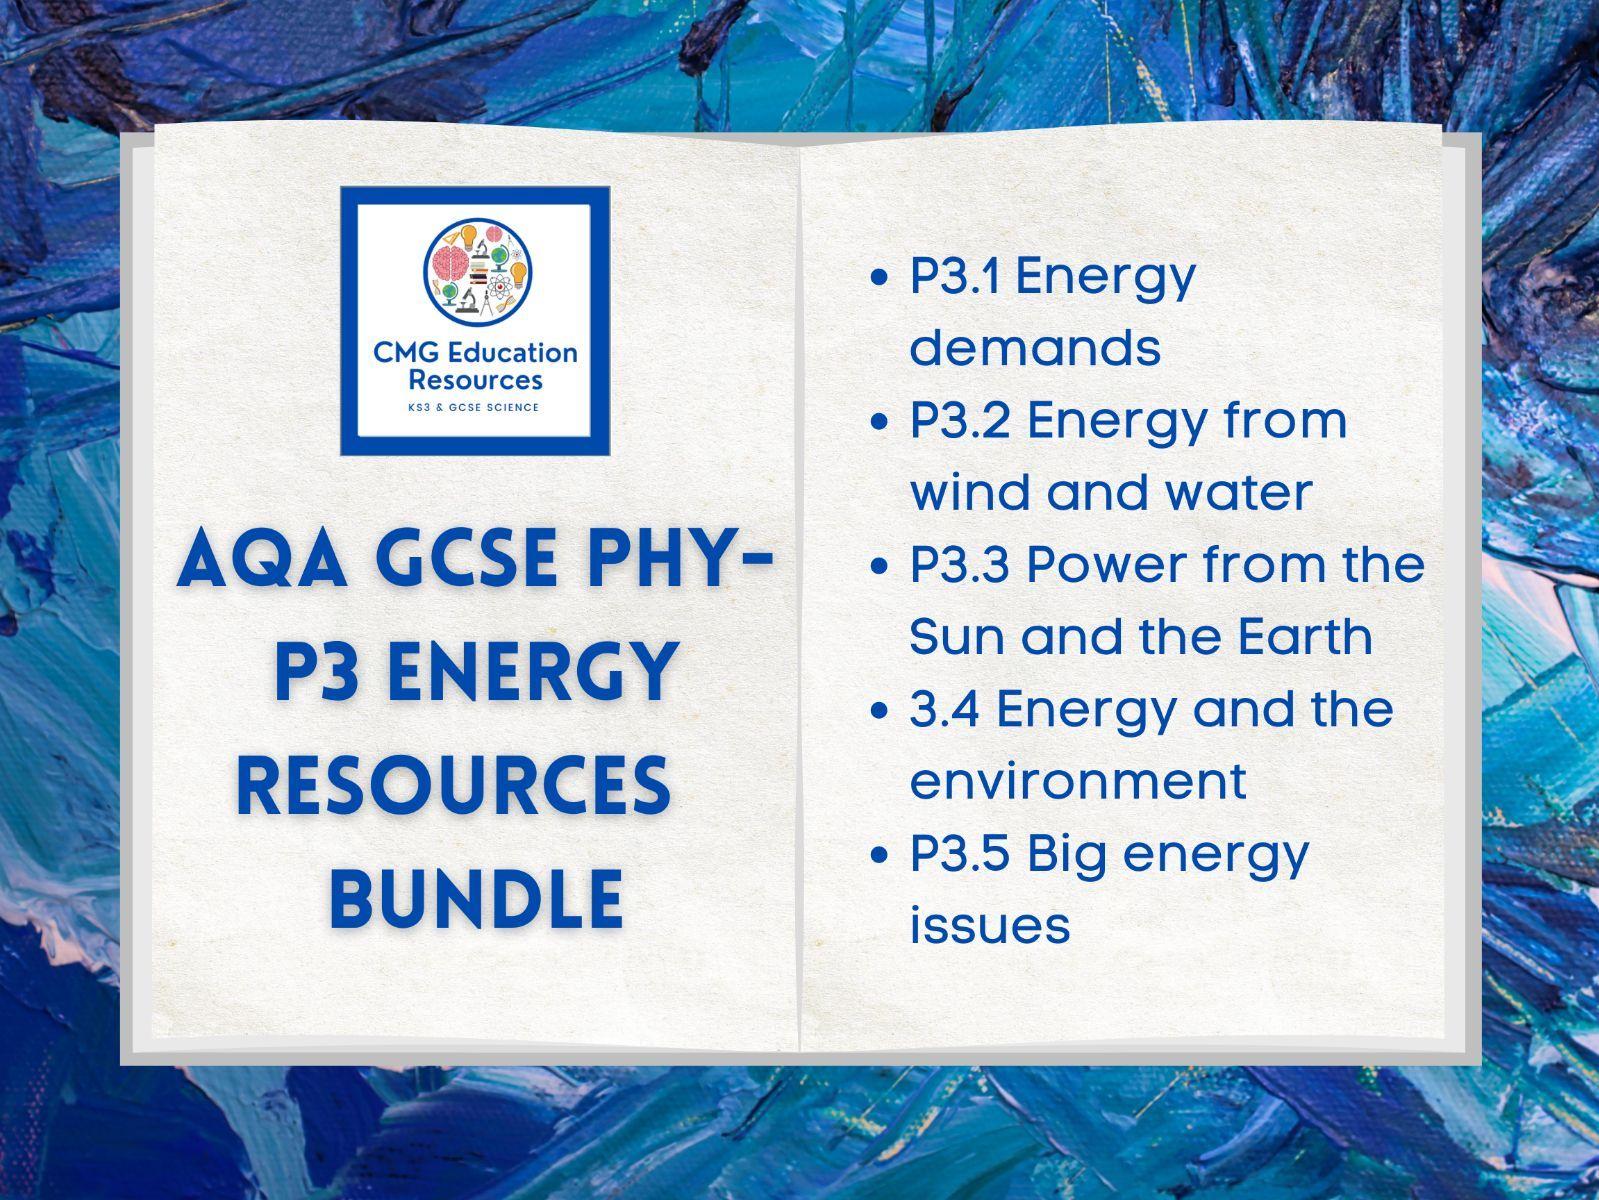 P3 Energy resources bundle (AQA 9-1 GCSE Physics)